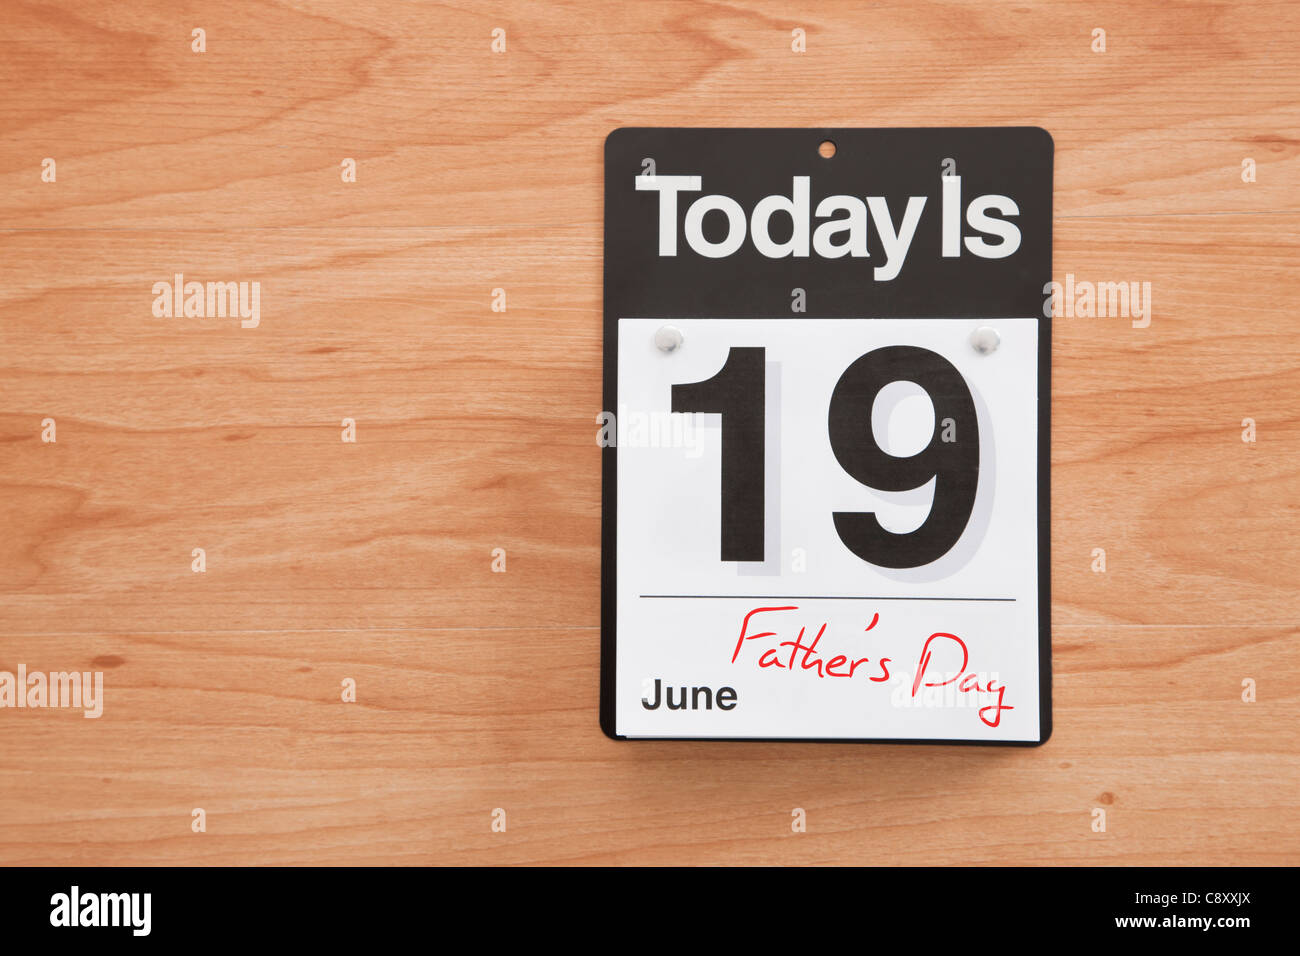 Fathers Day Calendar Stock Photos Fathers Day Calendar Stock